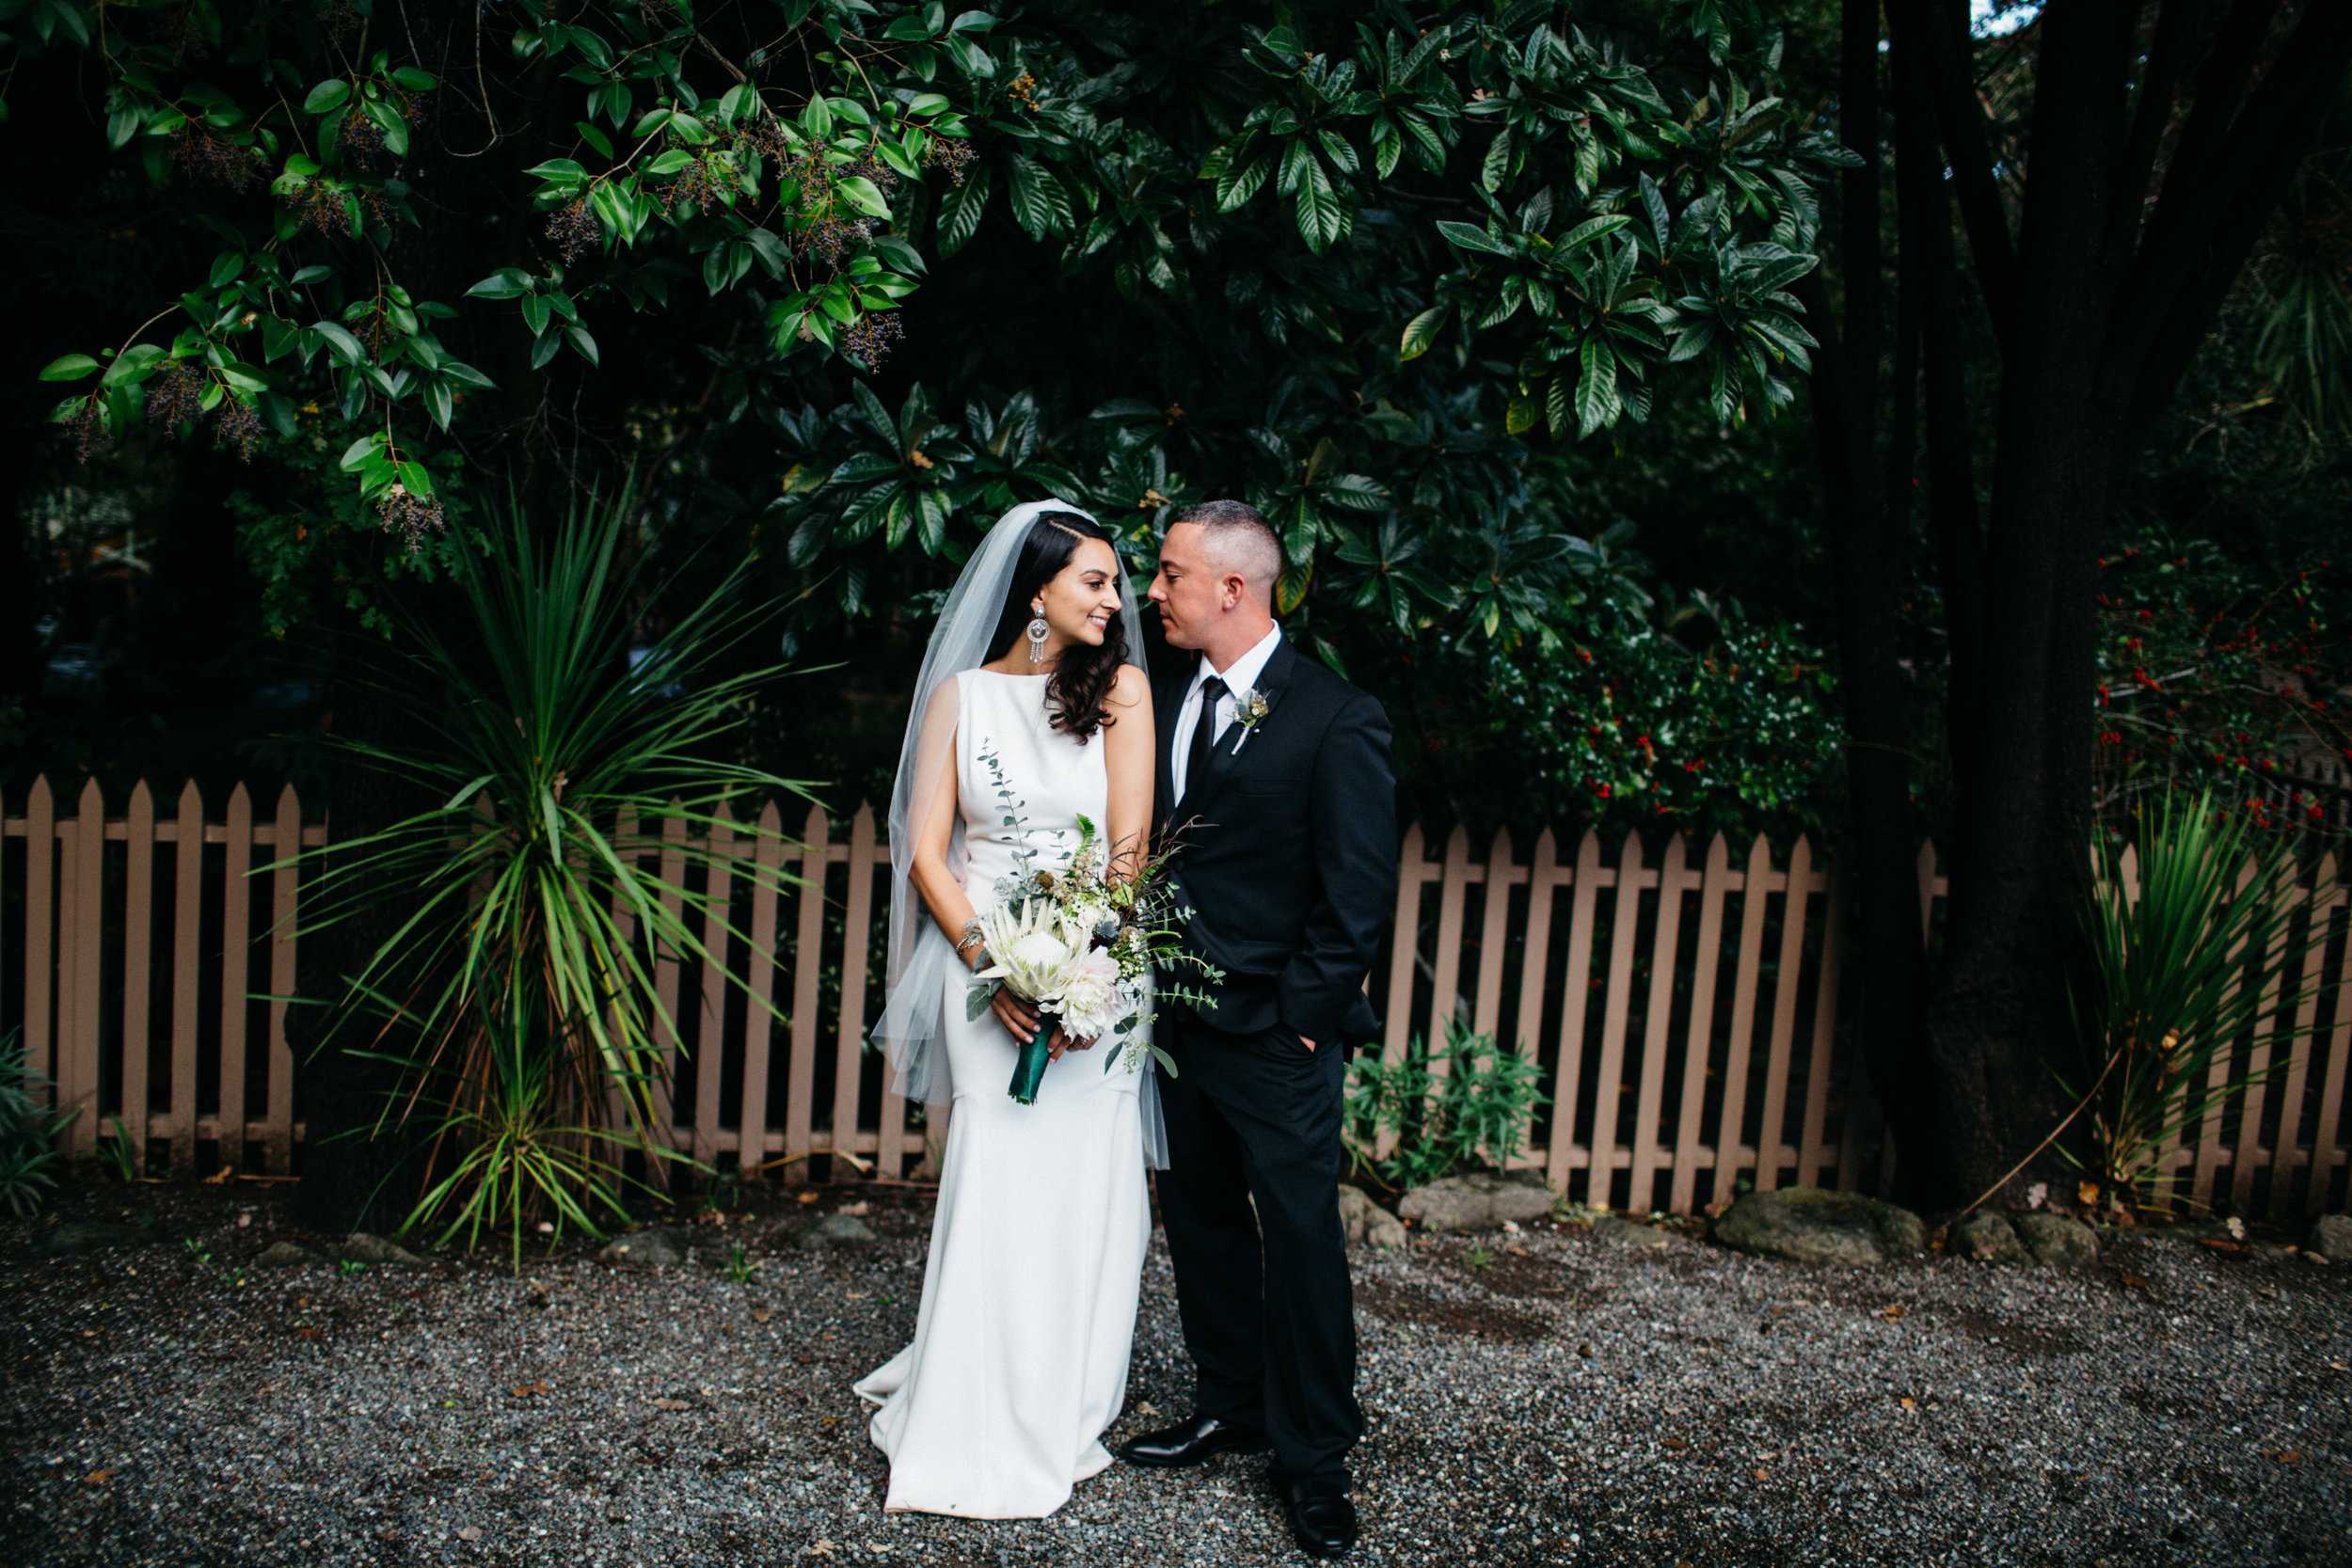 sweet_and_crafty_jocelyn_domingo_wedding_portfolio_115.jpg